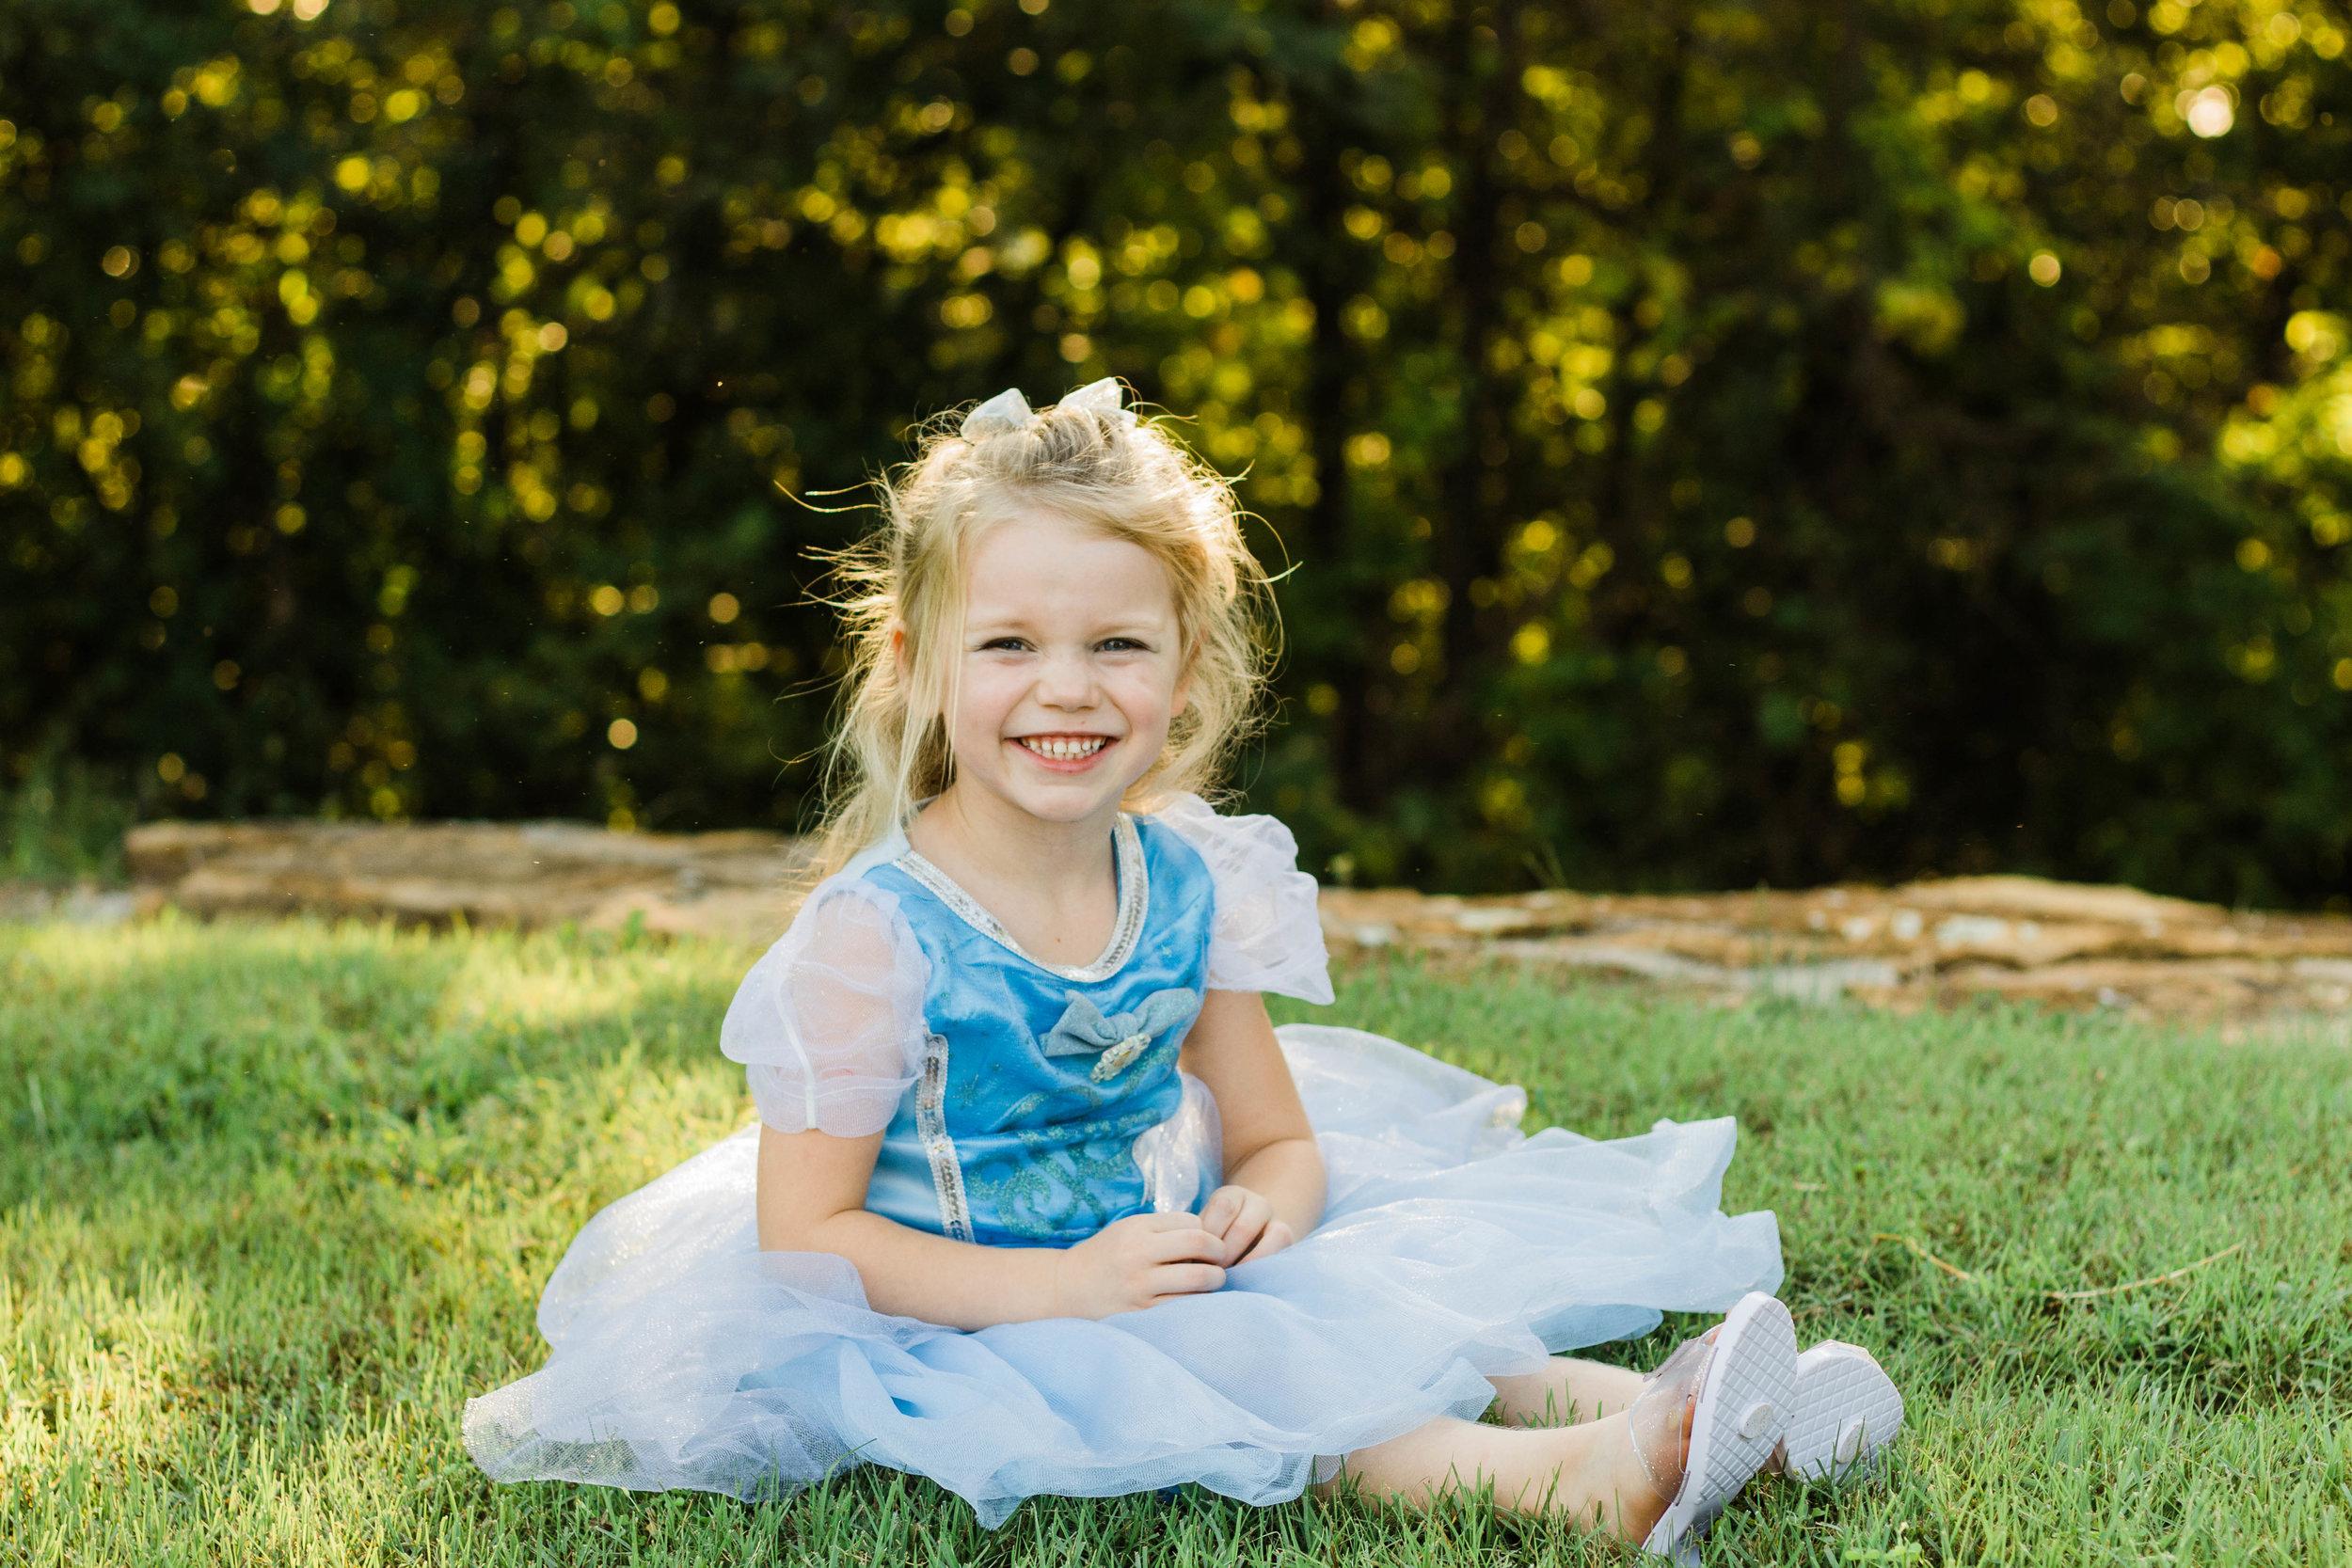 princessriley-21.jpg